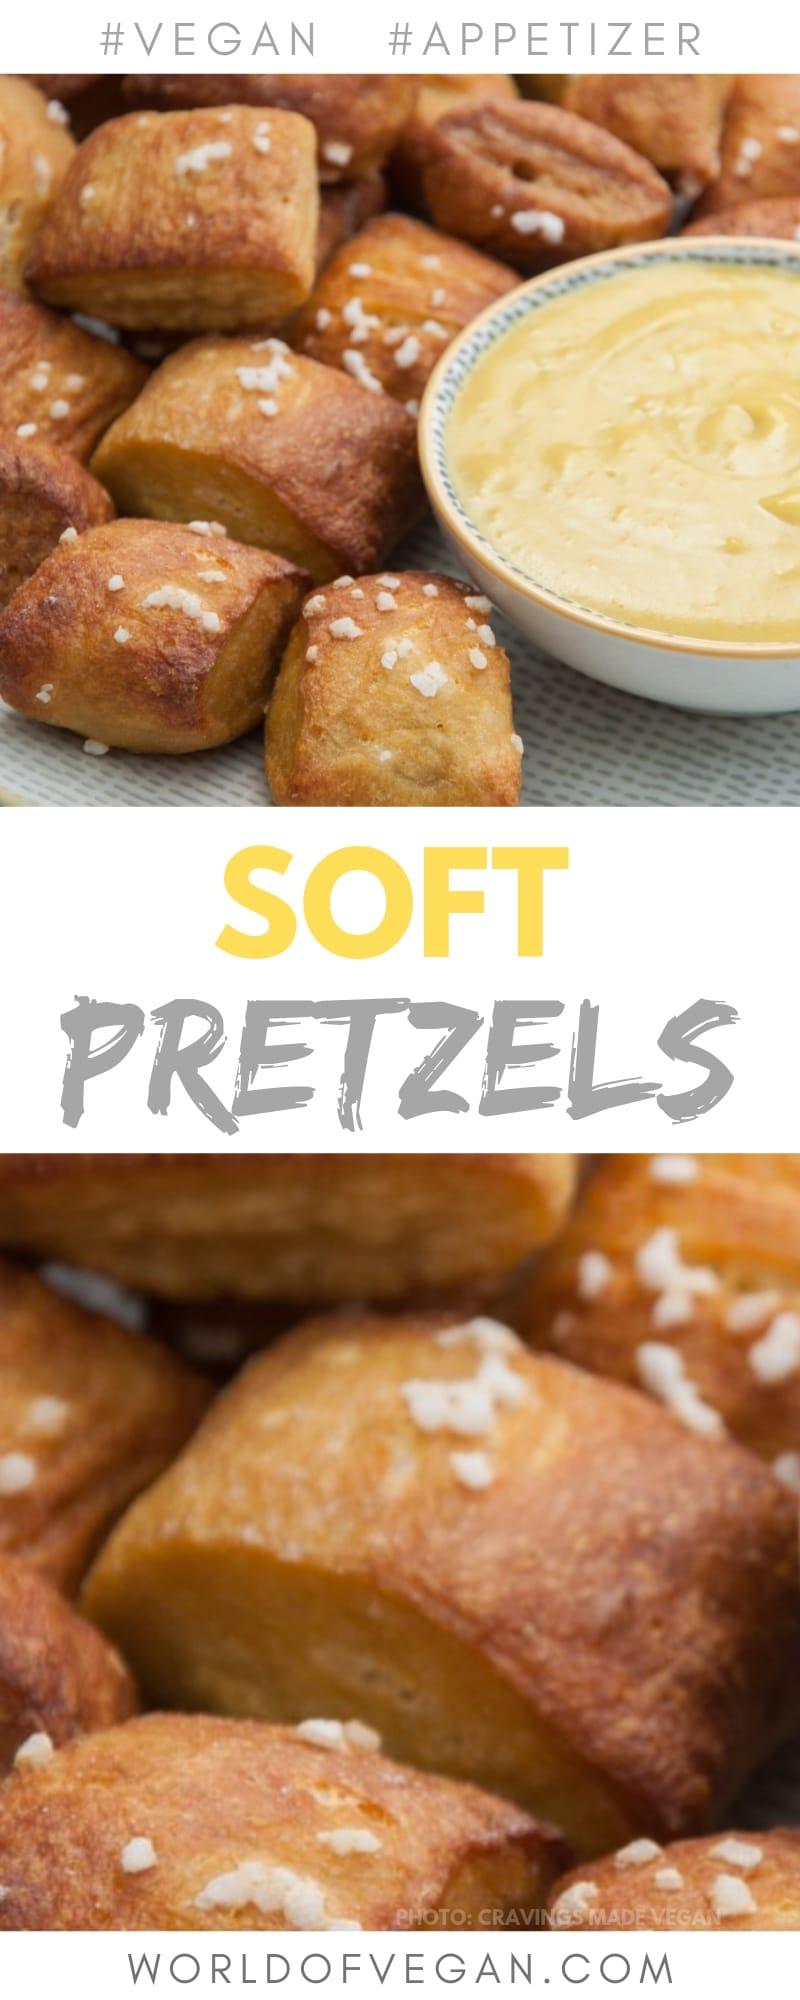 Vegan Soft Pretzels with Cheese Dip | Easy Appetizer Recipe | World of Vegan | #pretzels #cravings #snack #dip #cheese #worldofvegan